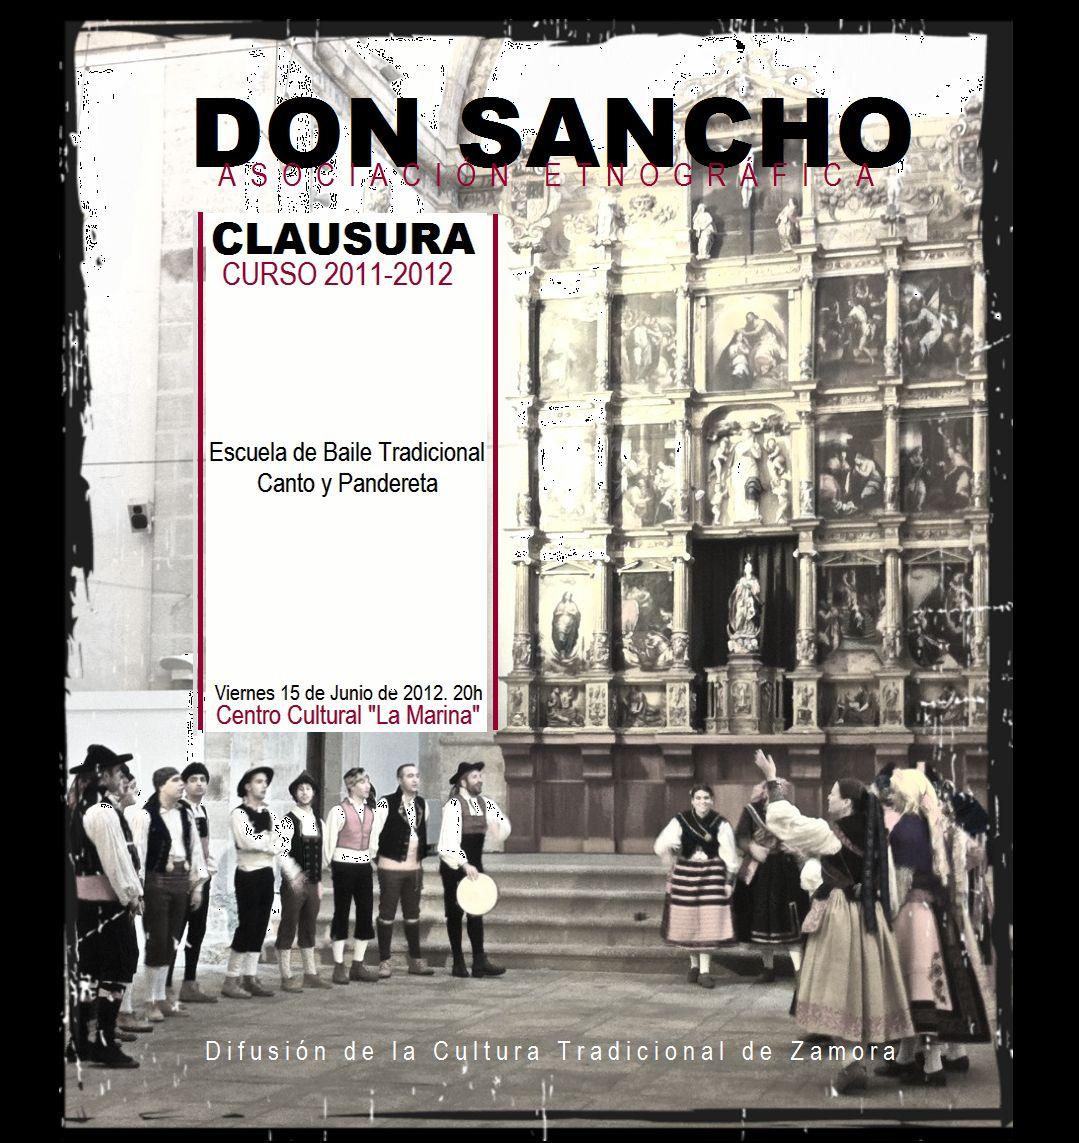 DON SANCHO. Difusión de la Cultura Tradicional de Zamora ... - photo#20